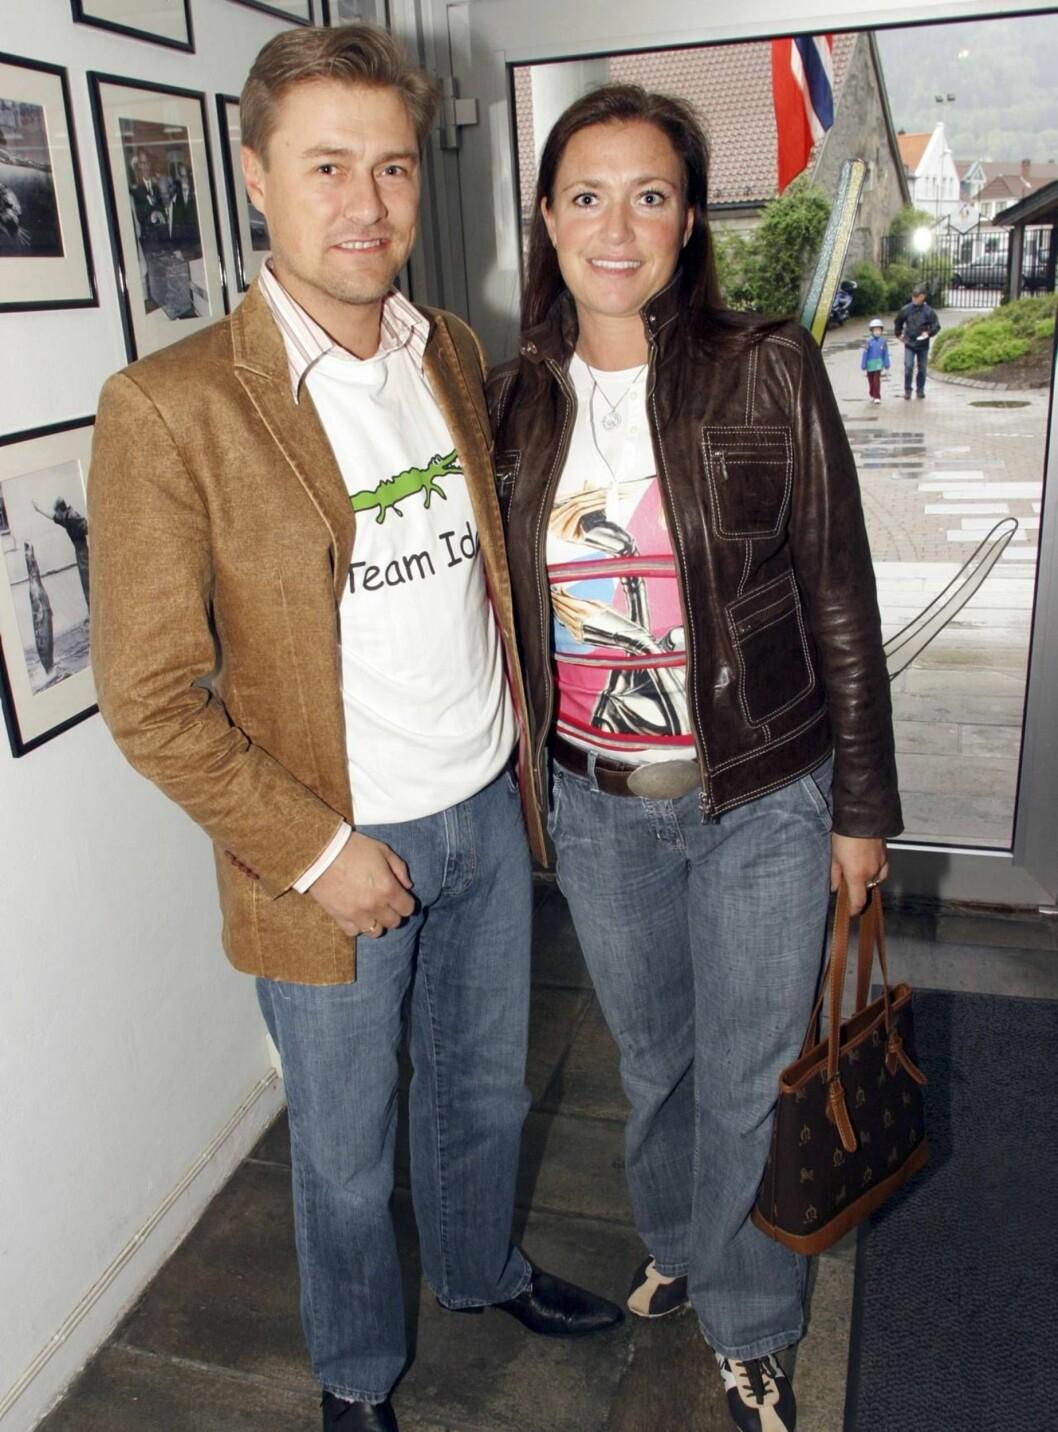 <strong>FAMILIEMANN:</strong> Idar Vollvik verner godt om privatlivet med kona Anita.